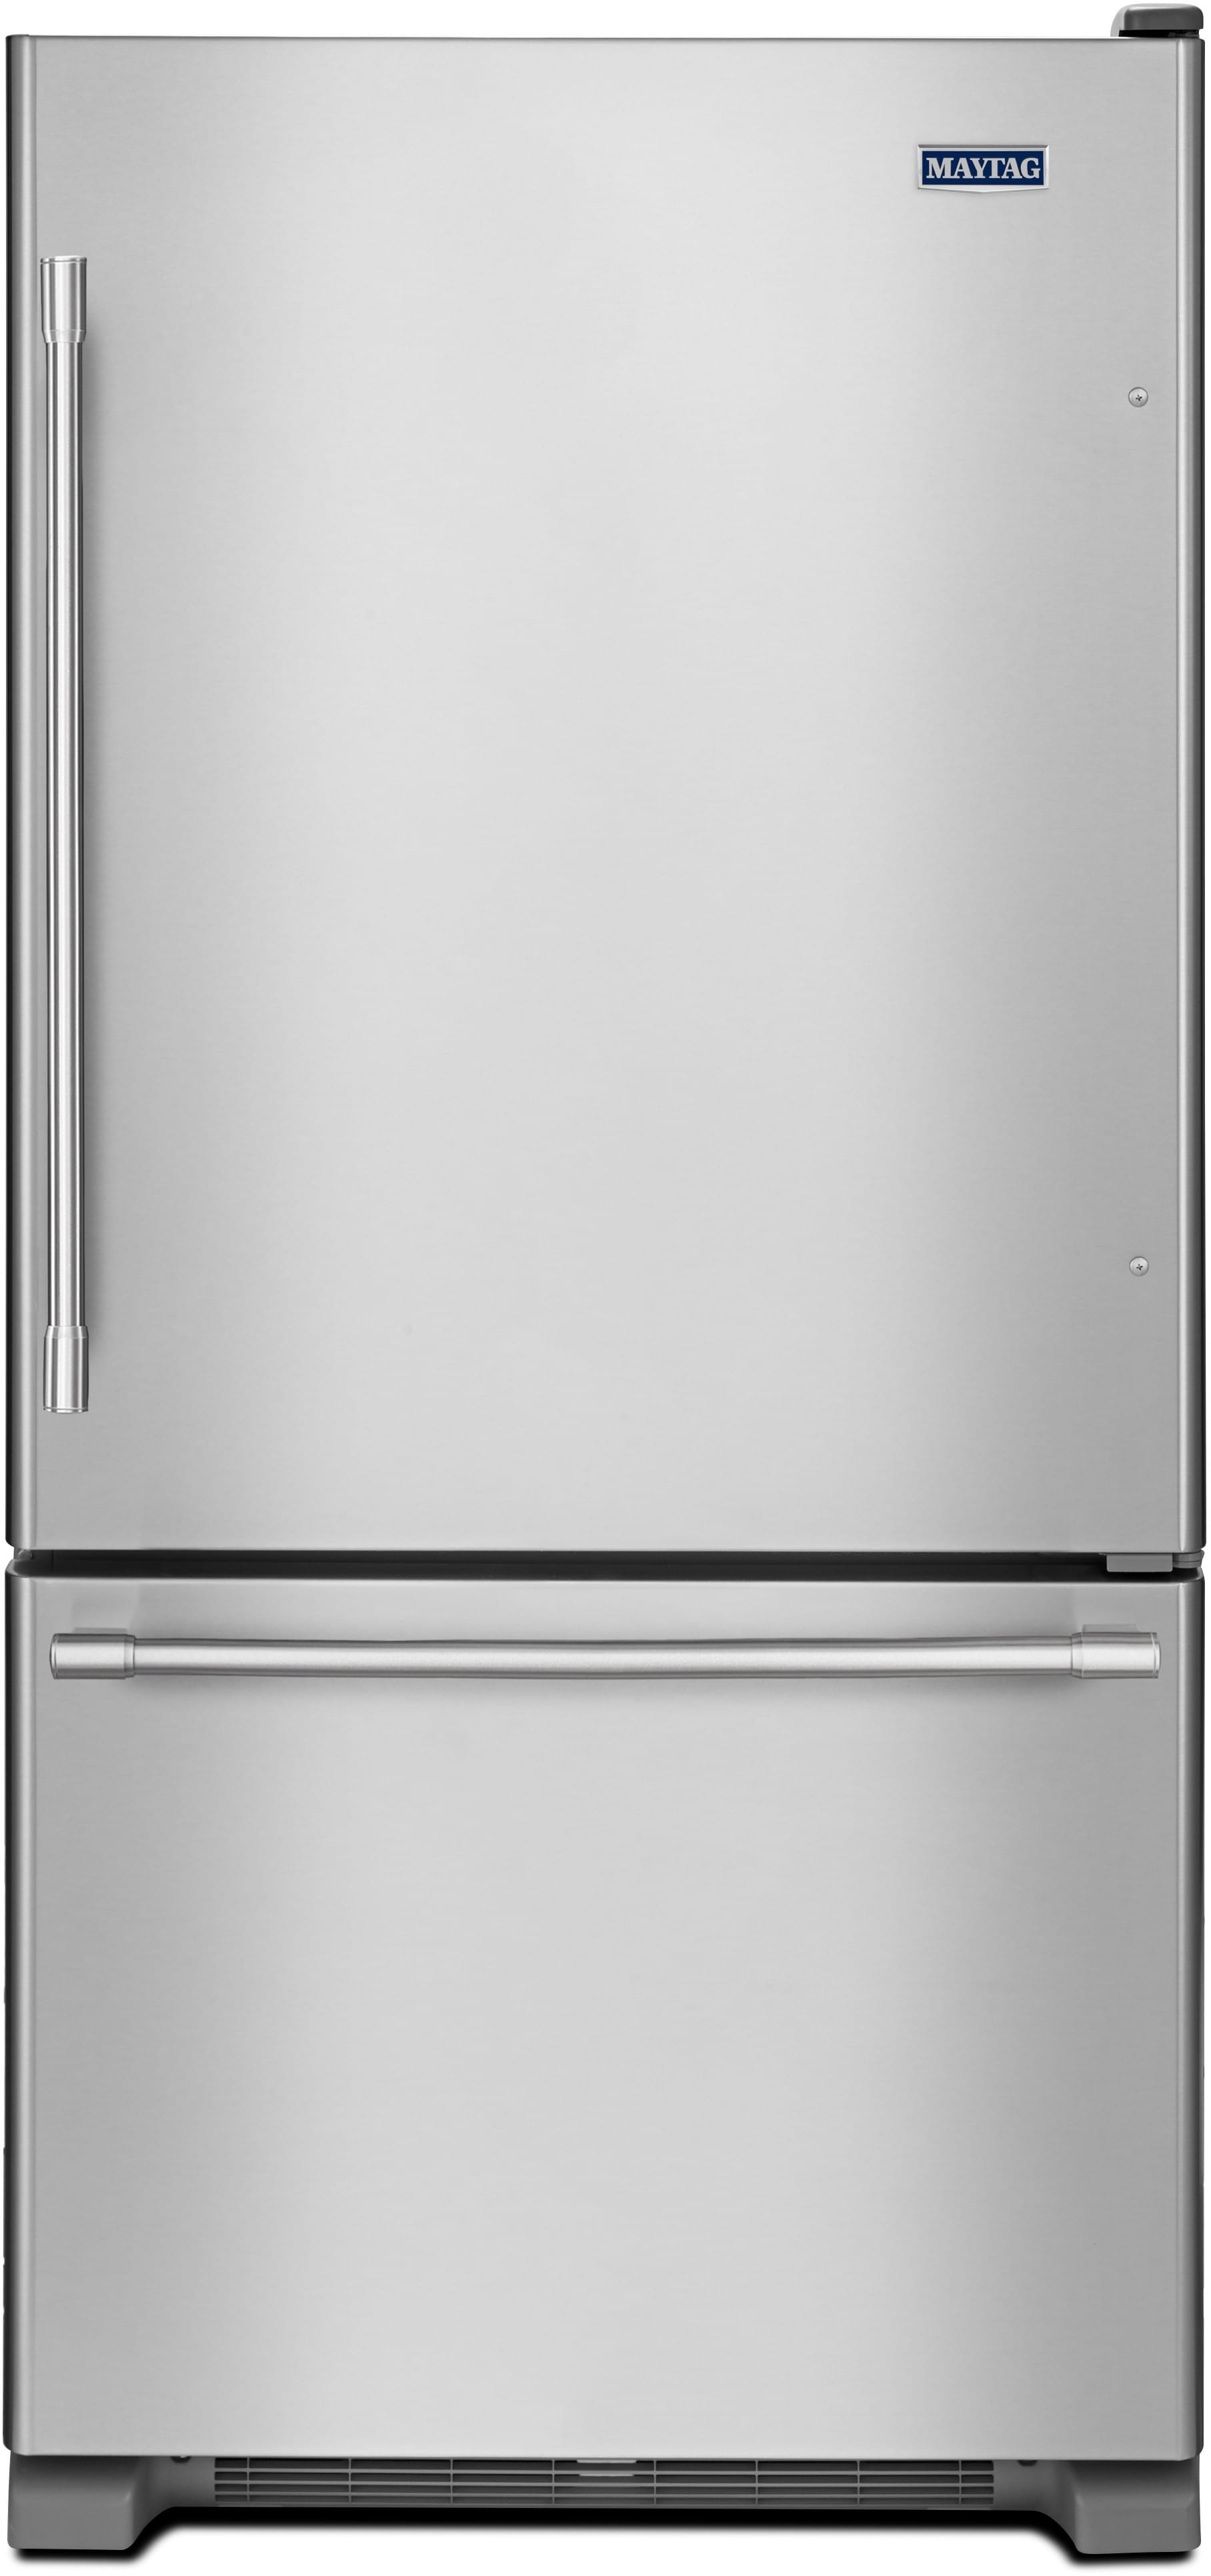 Maytag Mbf1958fez 30 Inch Bottom Freezer Refrigerator With